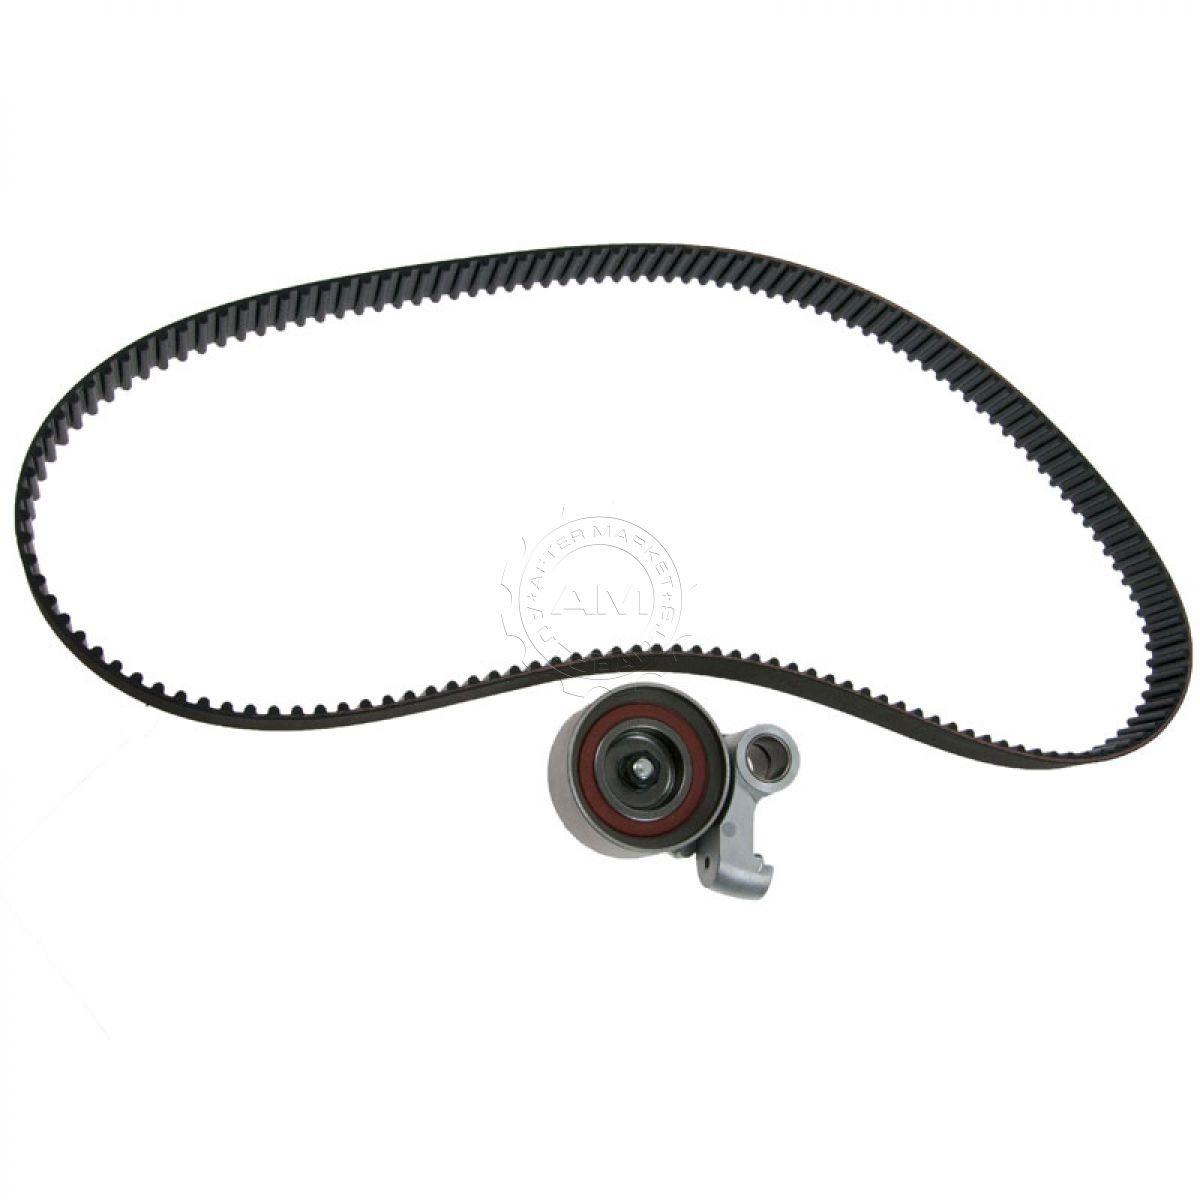 Gates Tck215 Timing Belt W Tensioner Pulley For Lexus